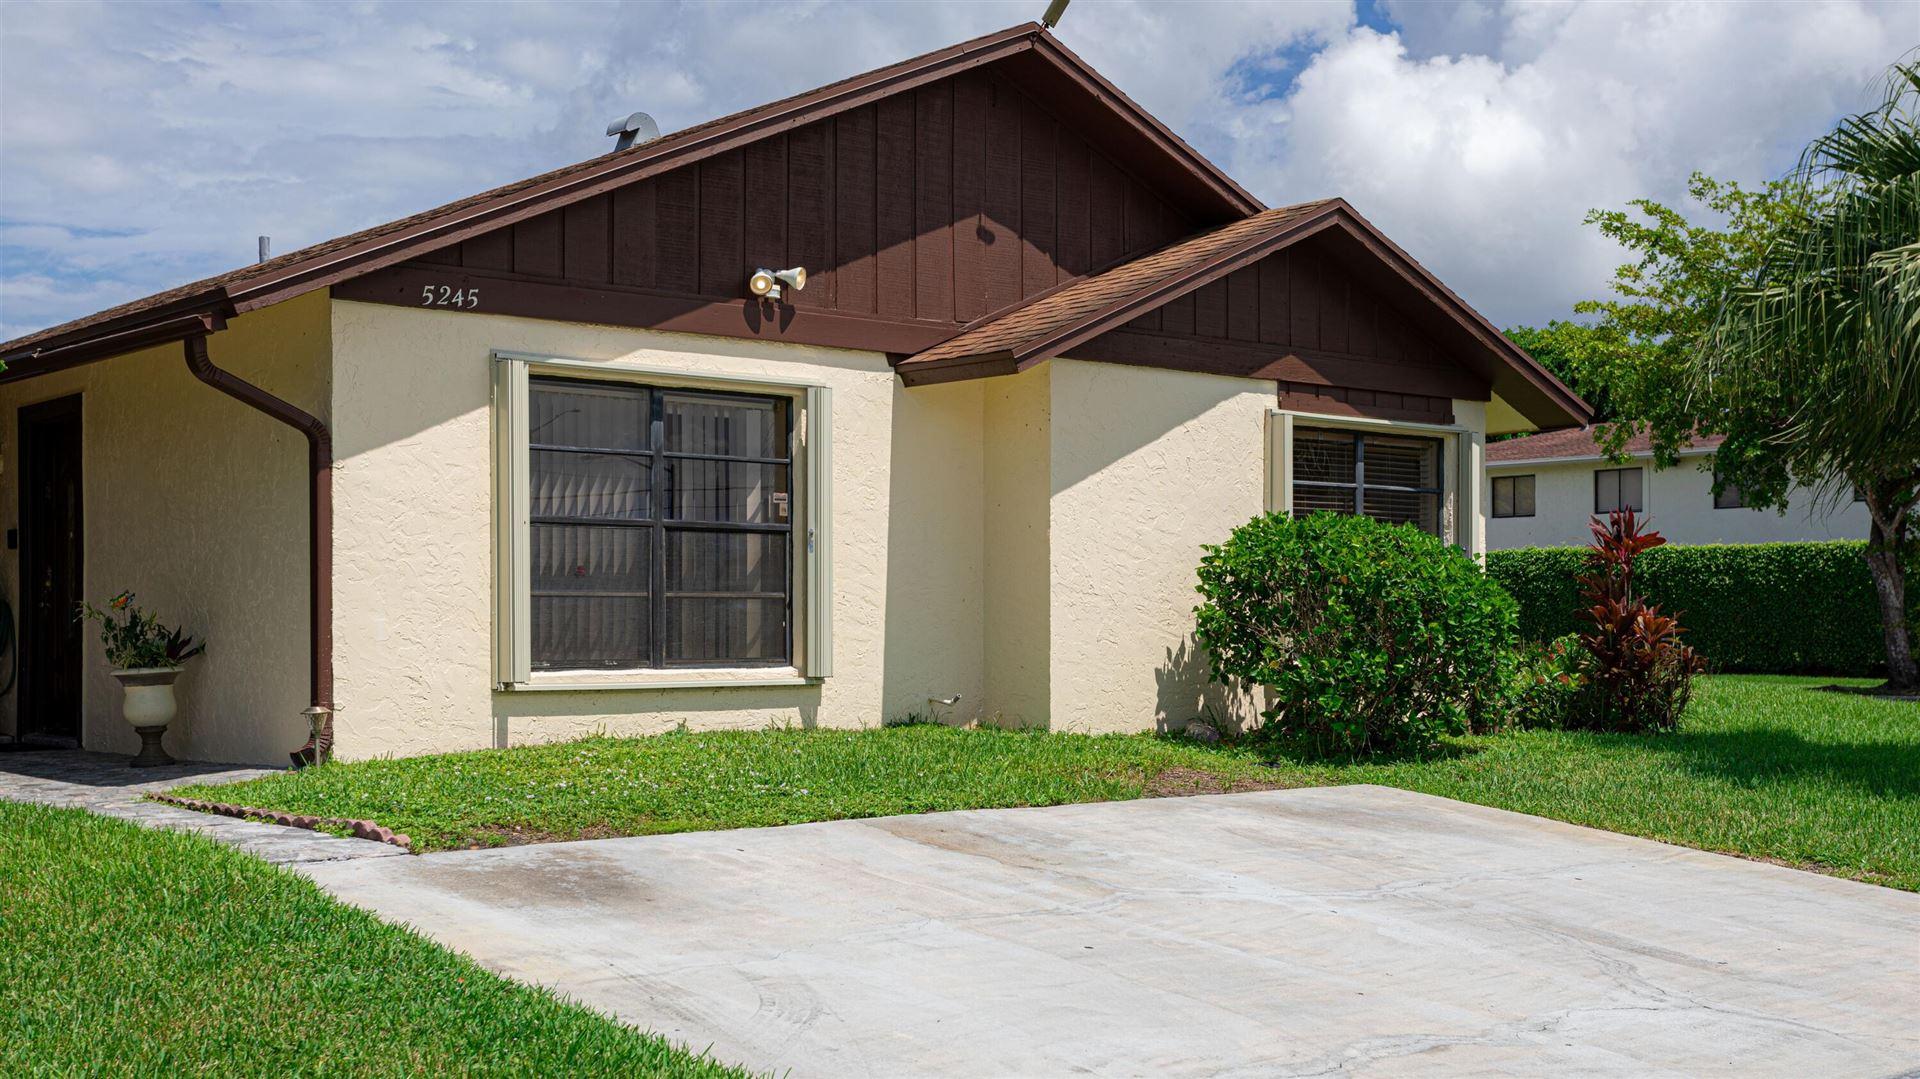 5245 Robbie Court, West Palm Beach, FL 33415 - MLS#: RX-10746067